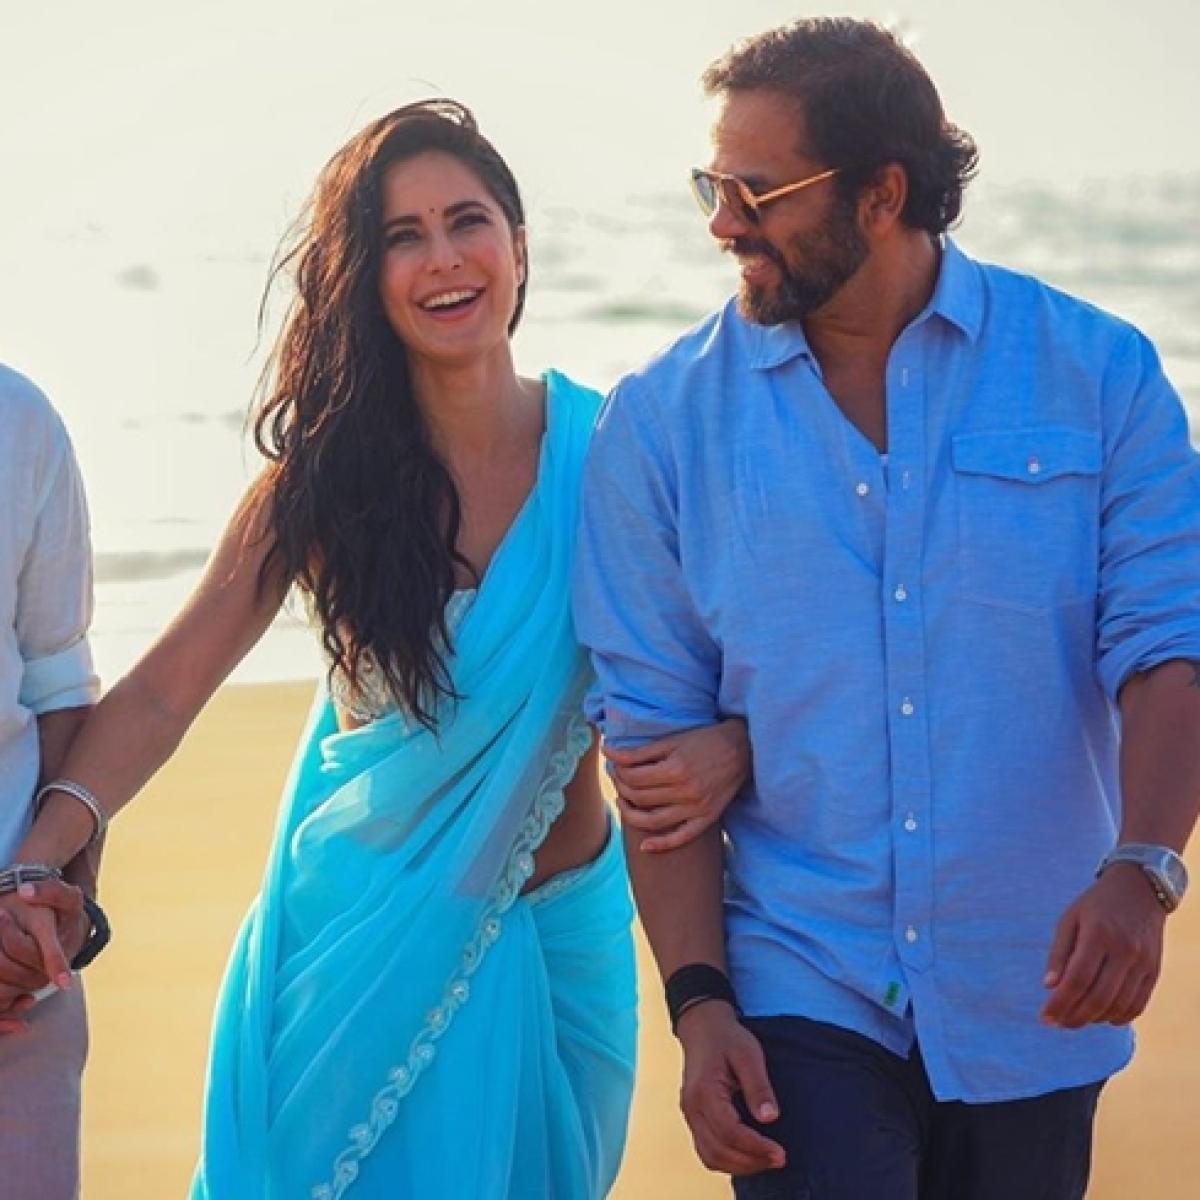 Akshay Kumar and Katrina Kaif's leaked footage from 'Sooryavanshi' sends fans into a frenzy